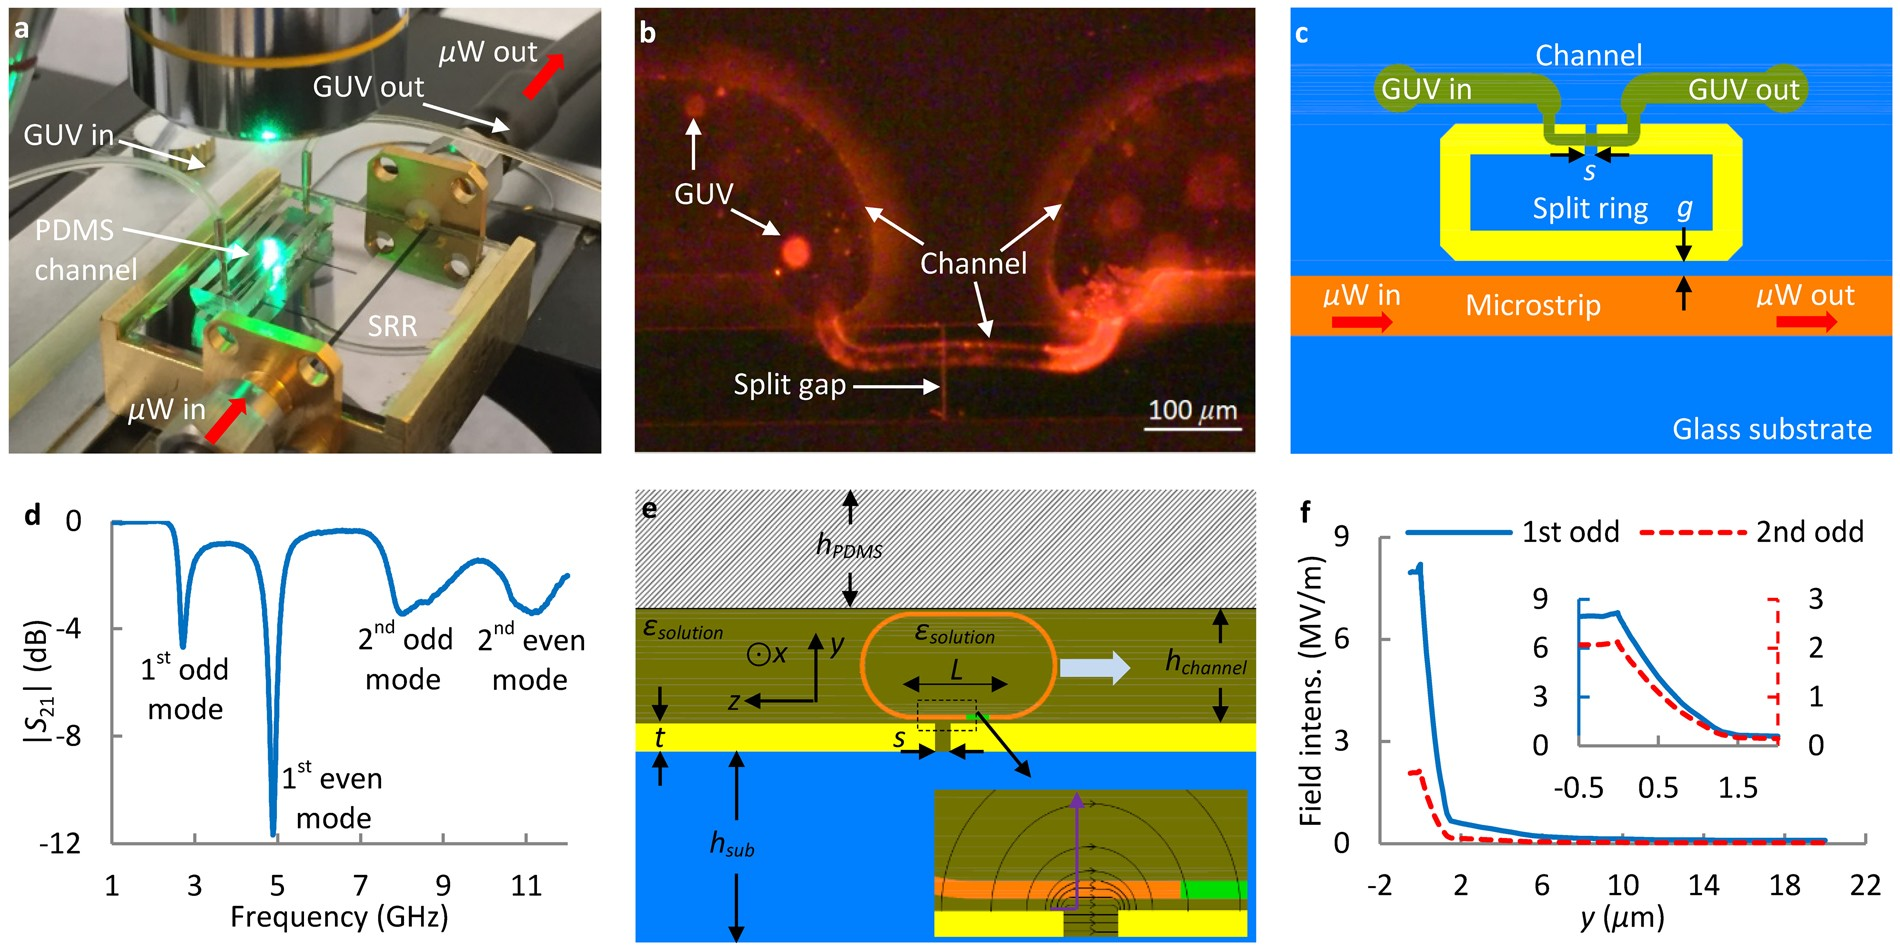 Microwave Measurement Of Giant Unilamellar Vesicles In Aqueous Little Wiring Diagram For Incubator Solution Scientific Reports